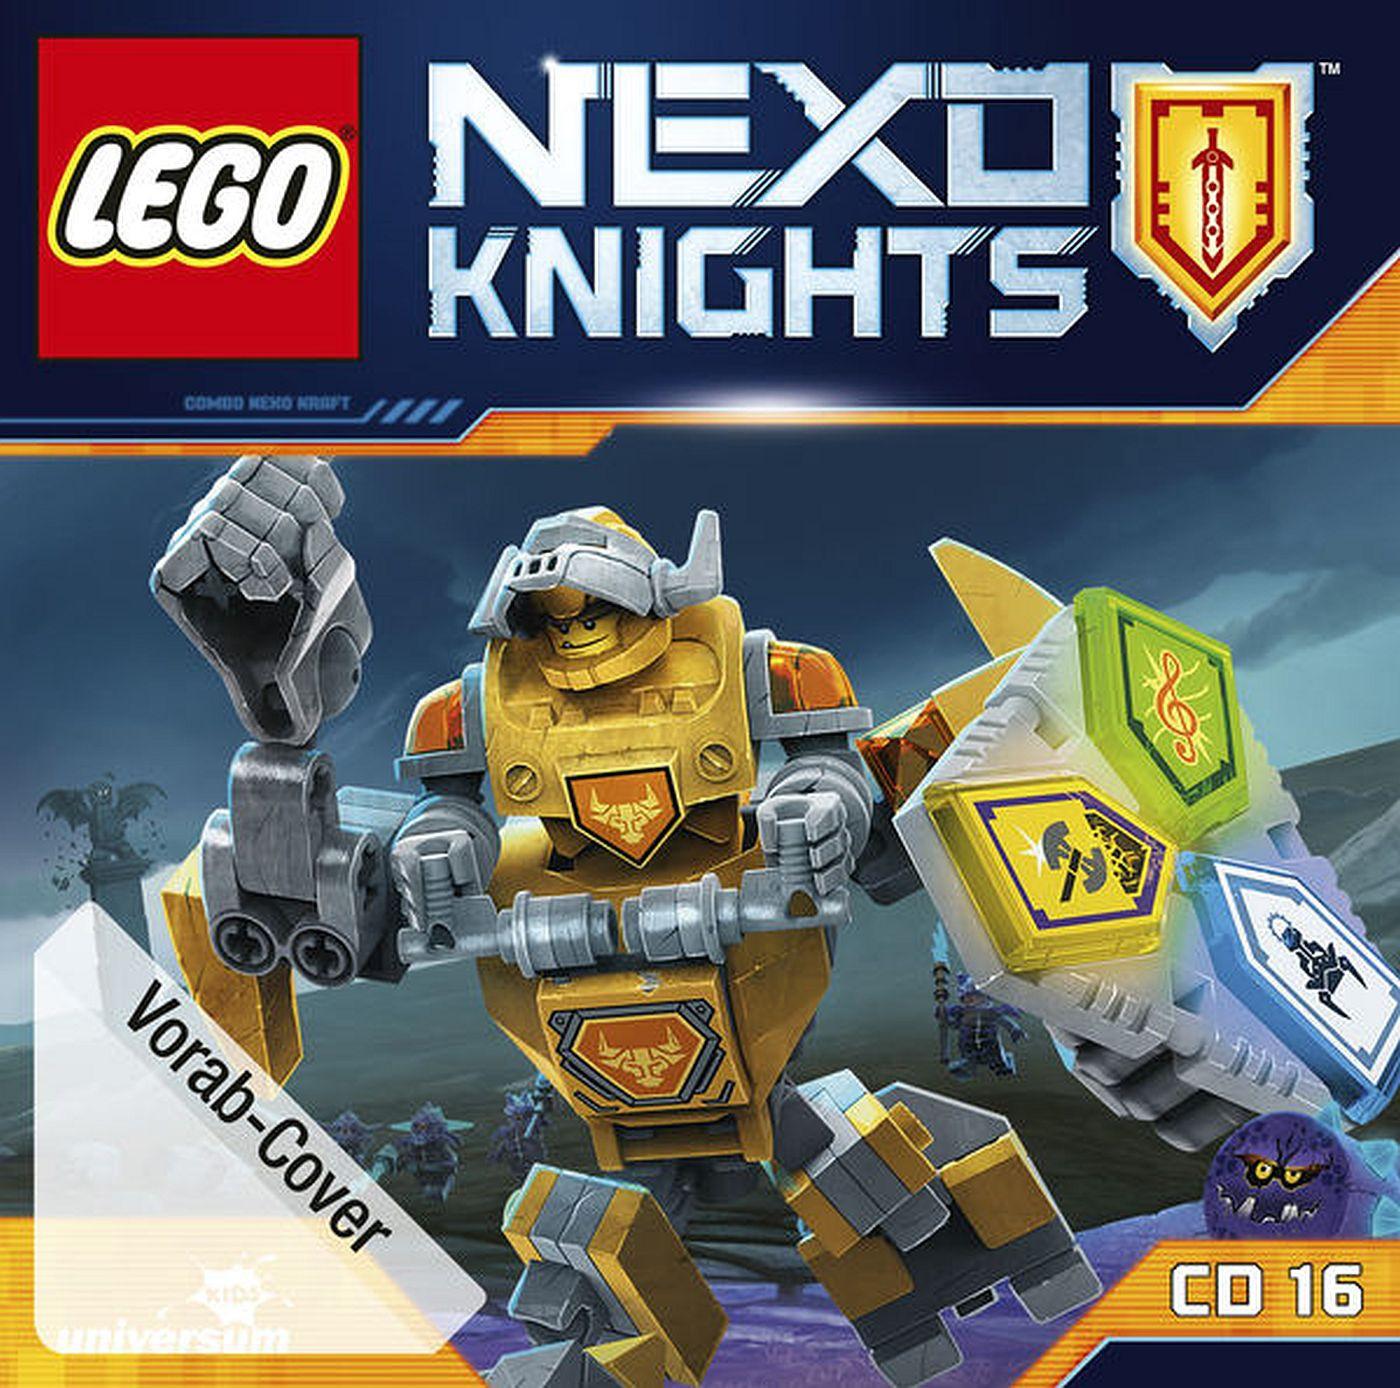 LEGO Nexo Knights (CD 16)